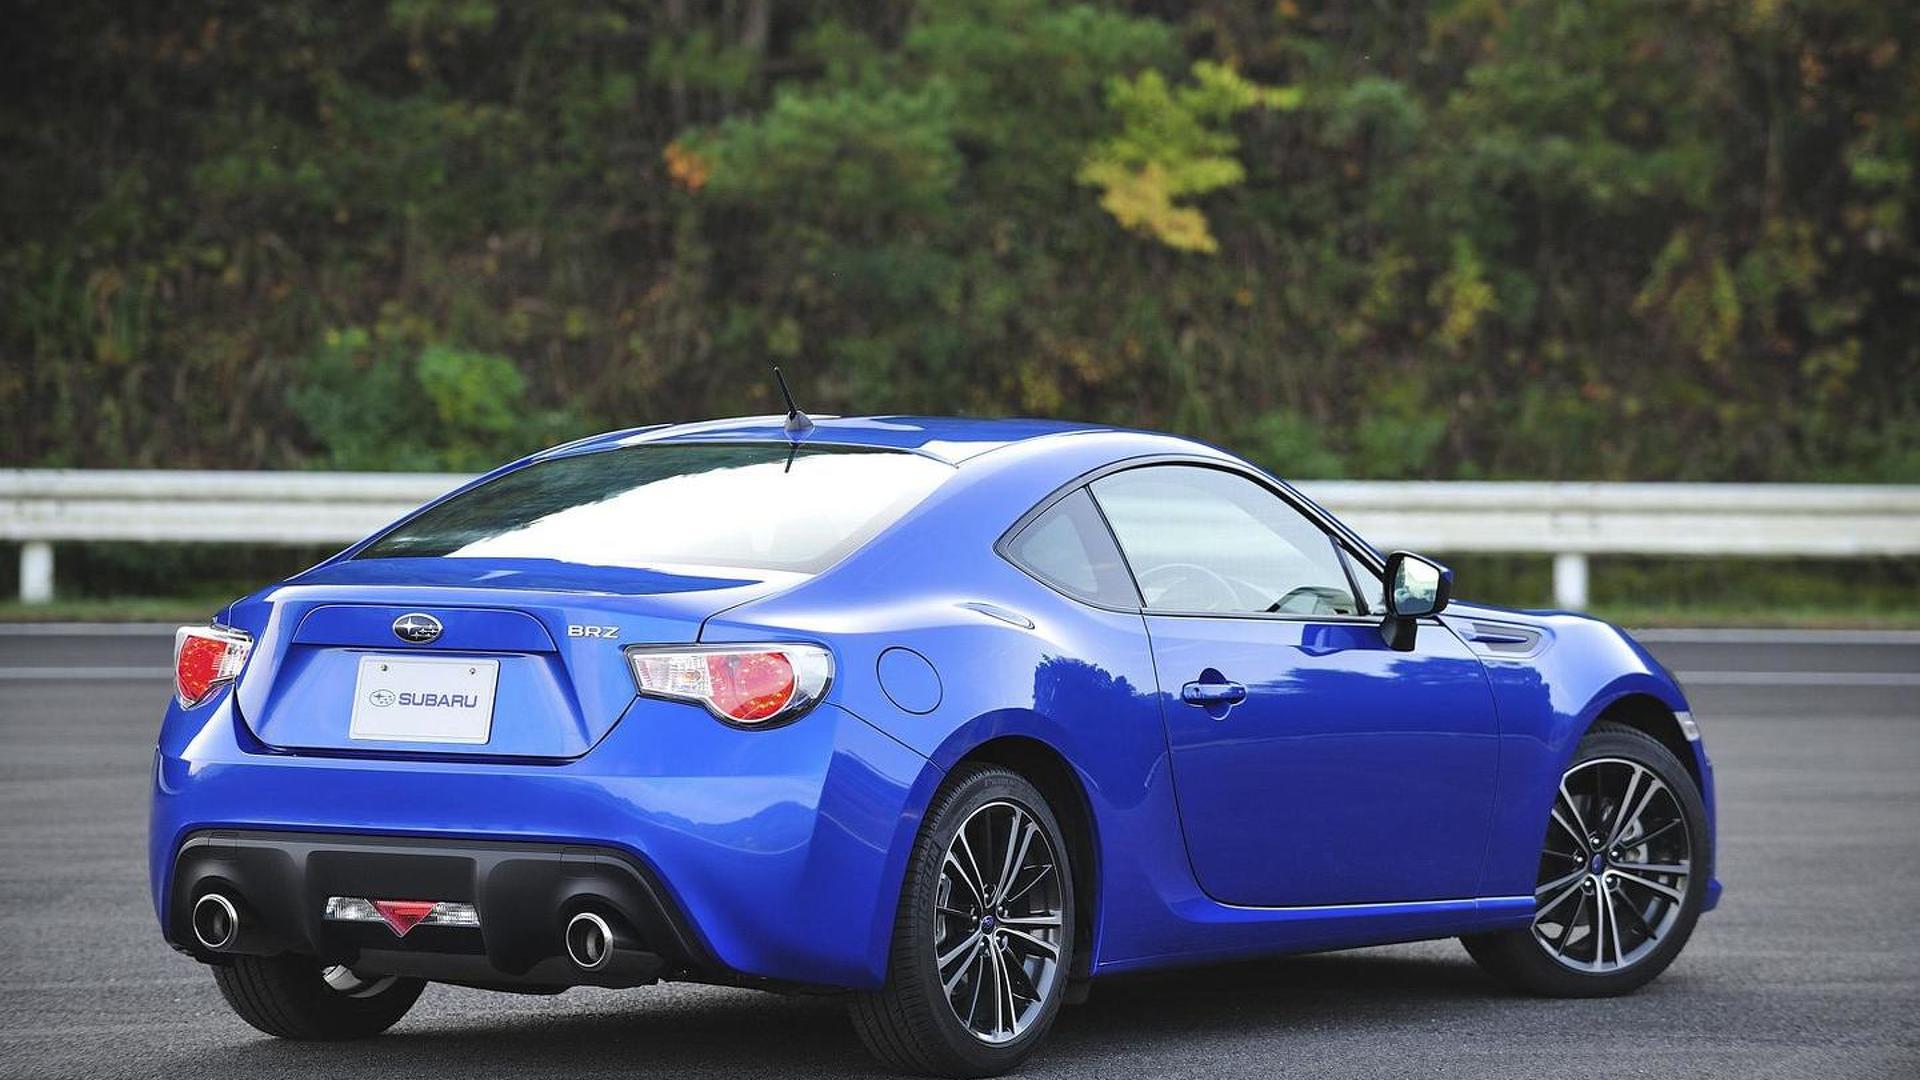 Subaru BRZ pricing announced (UK)